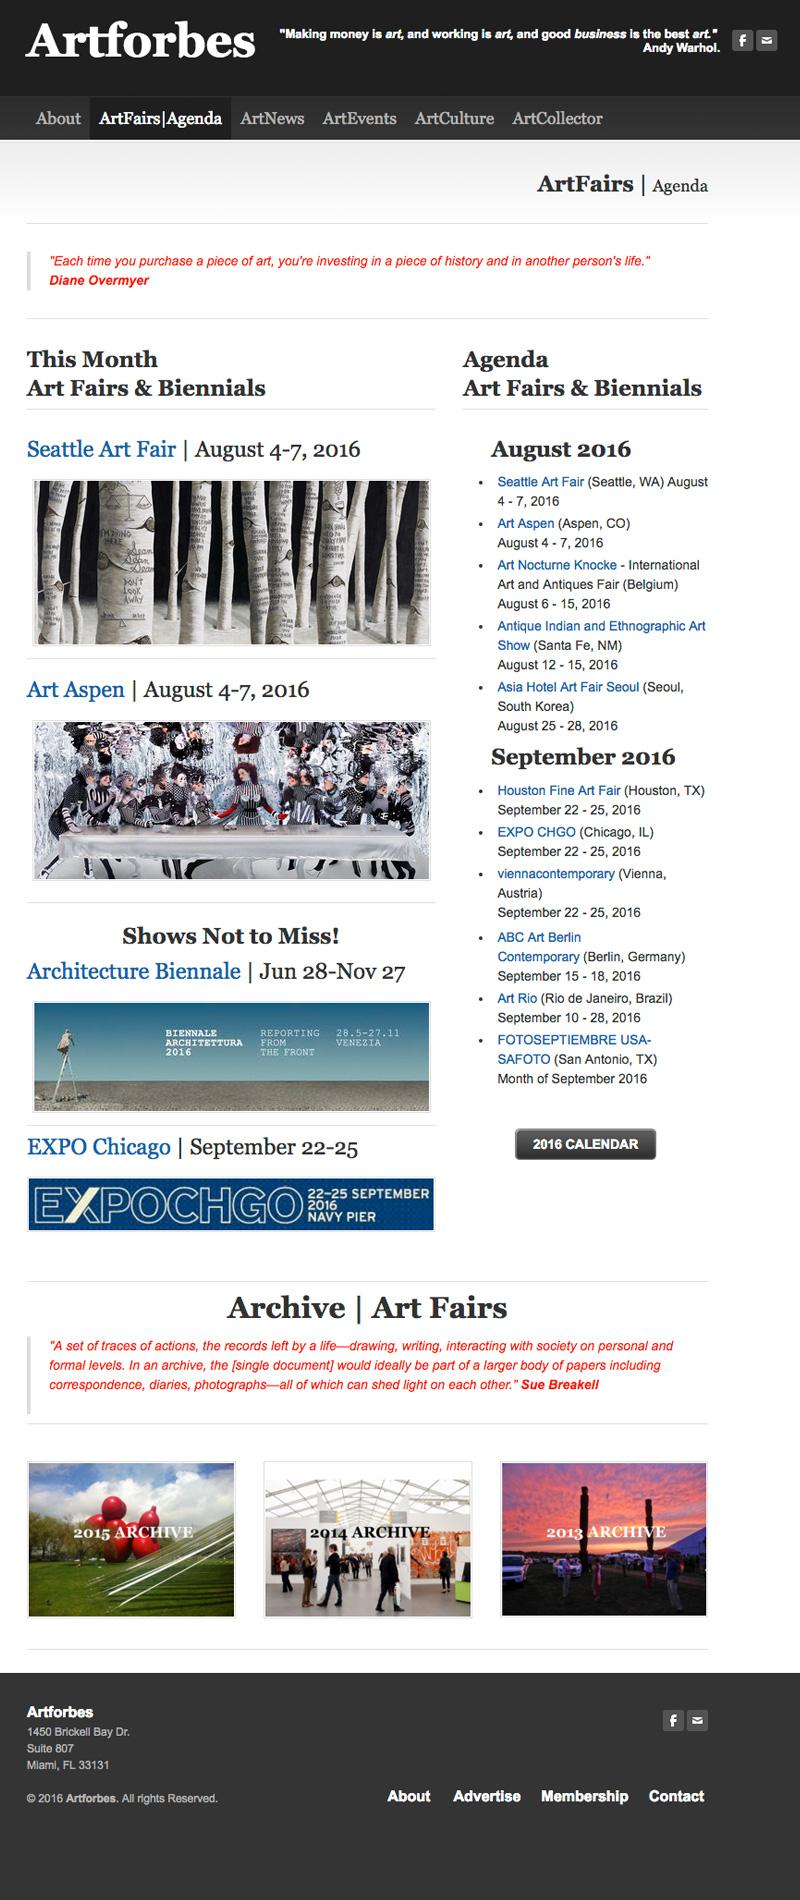 2016-FOTOSEPTIEMBRE-USA_Artfairs-Agenda_August_Artforbes